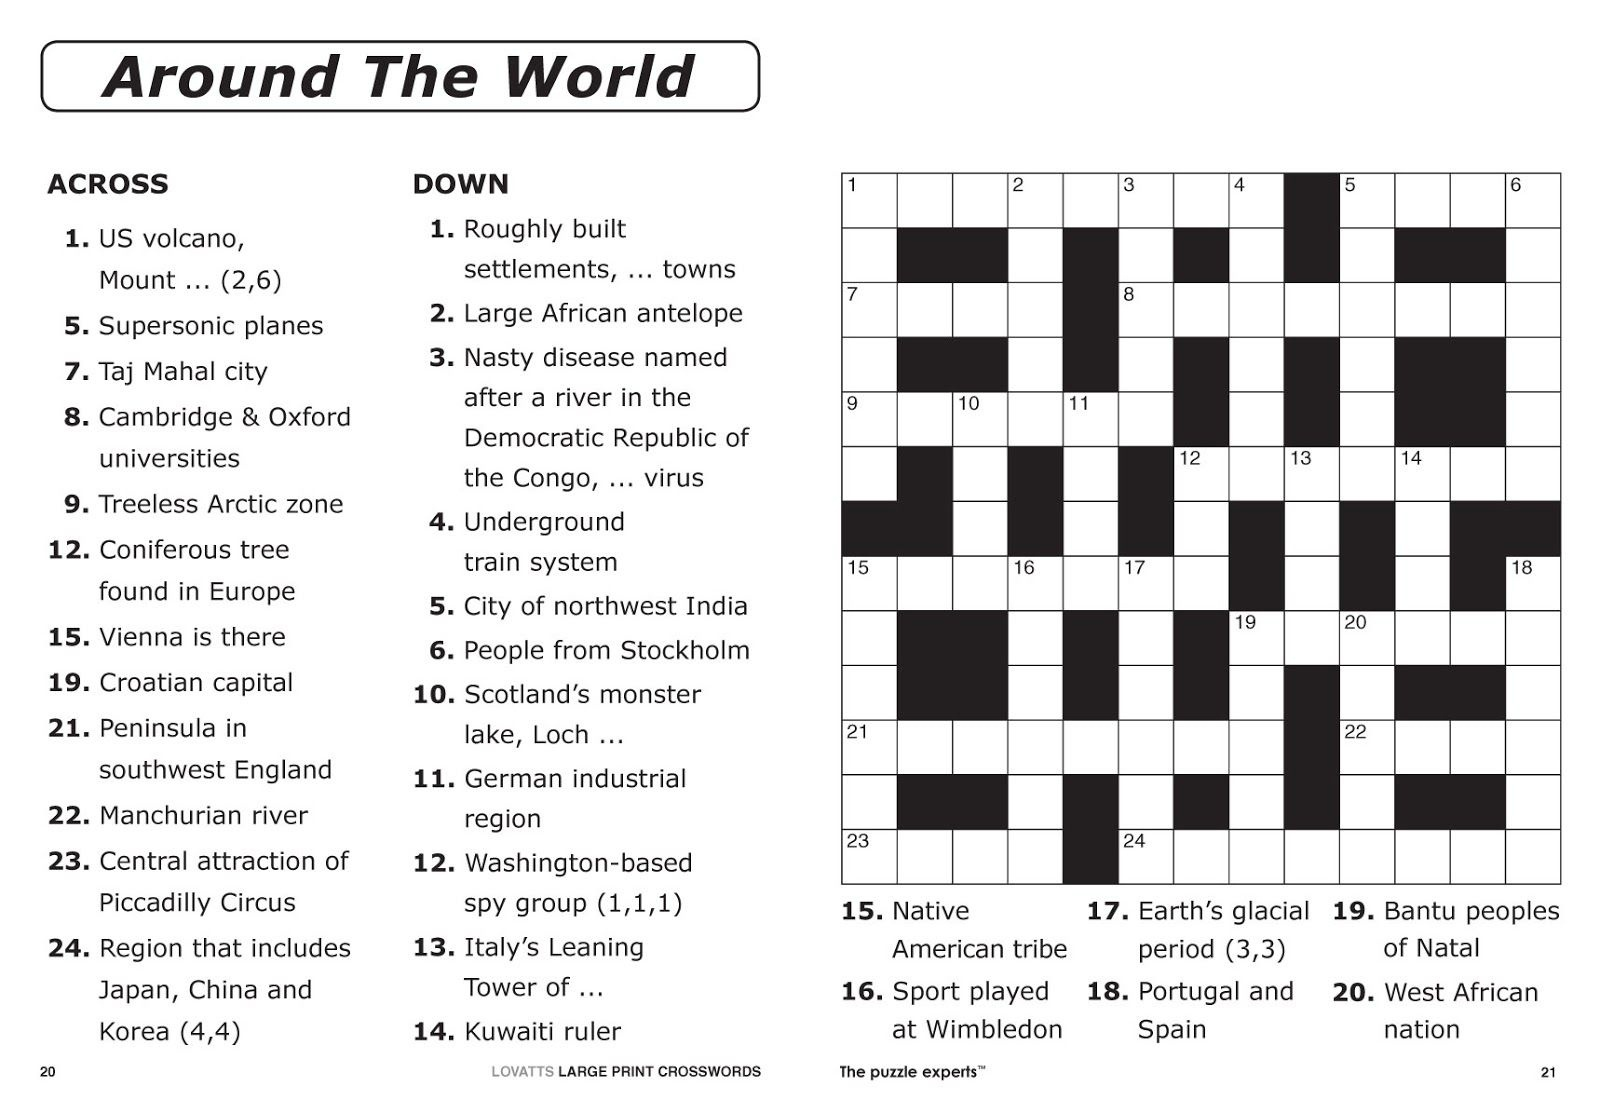 Free Printable Large Print Crossword Puzzles   M3U8 - Free Printable Crossword Puzzles For Adults